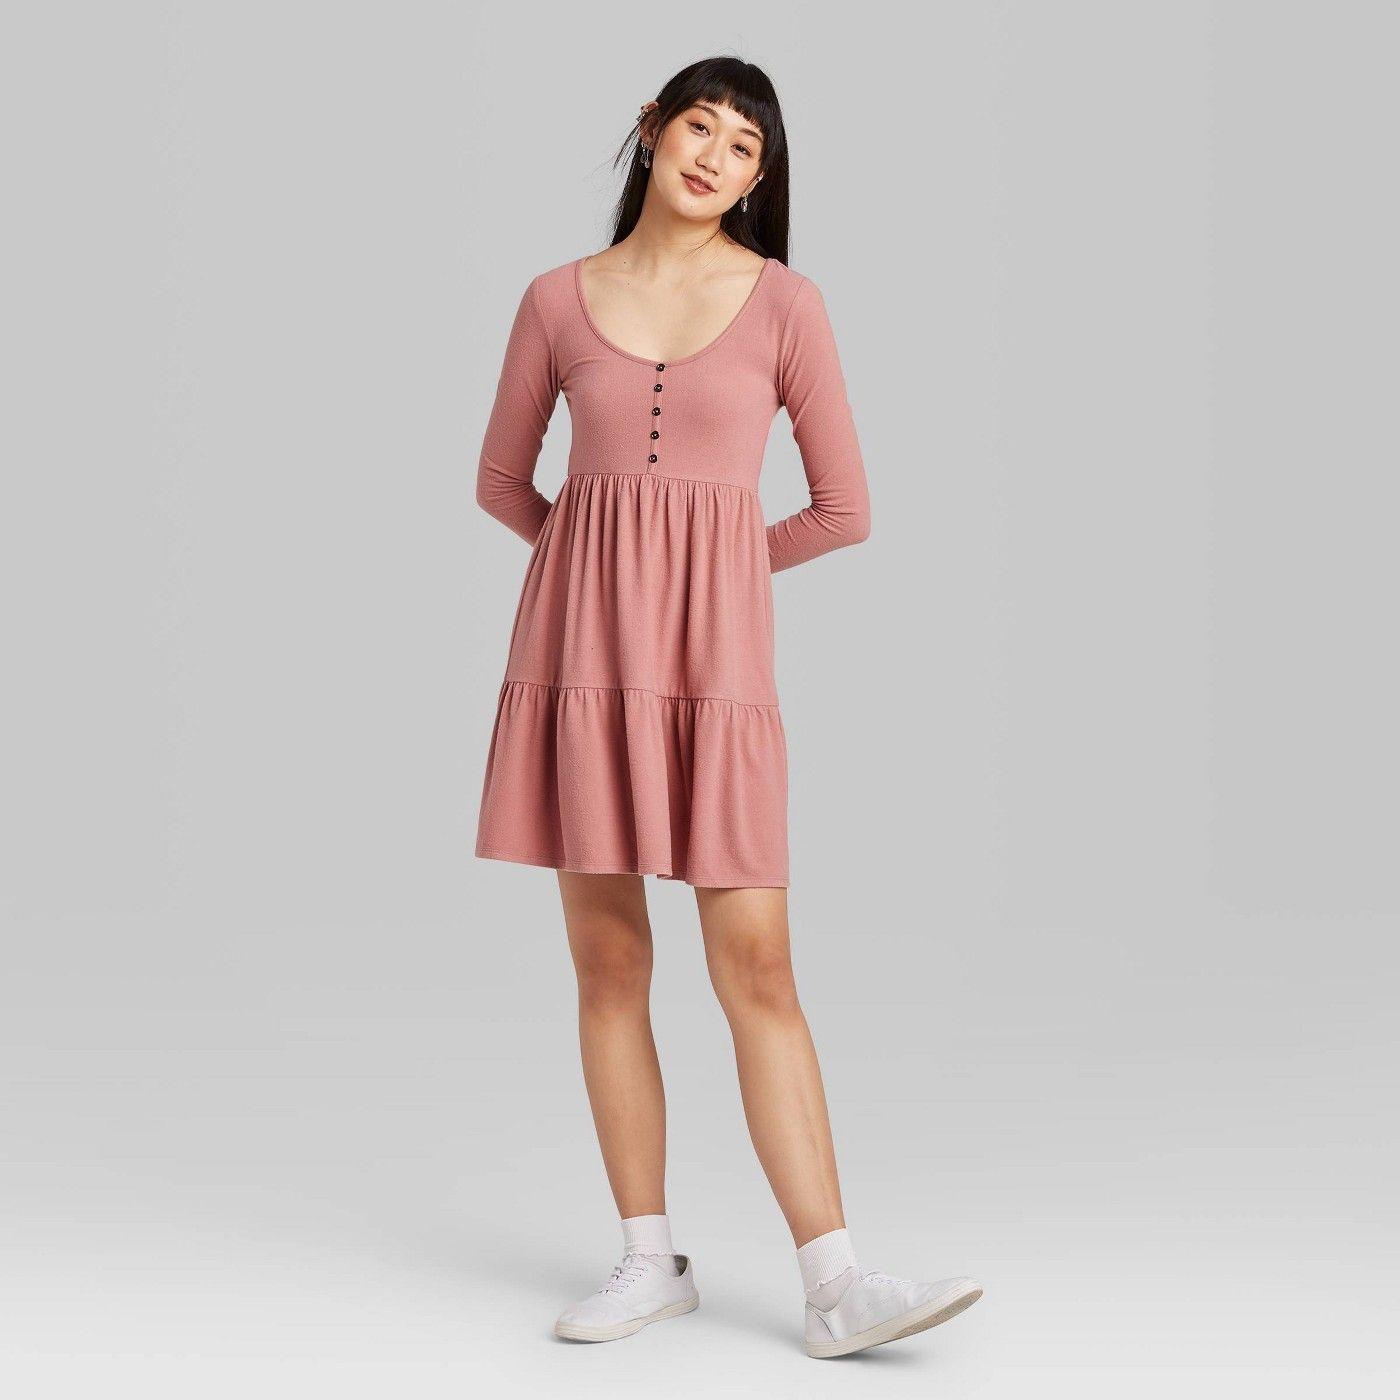 Women S Long Sleeve Round Neck Tiered Babydoll Dress Wild Fablea 20 Affiliate Sleeve Ad Neck Women [ 1400 x 1400 Pixel ]